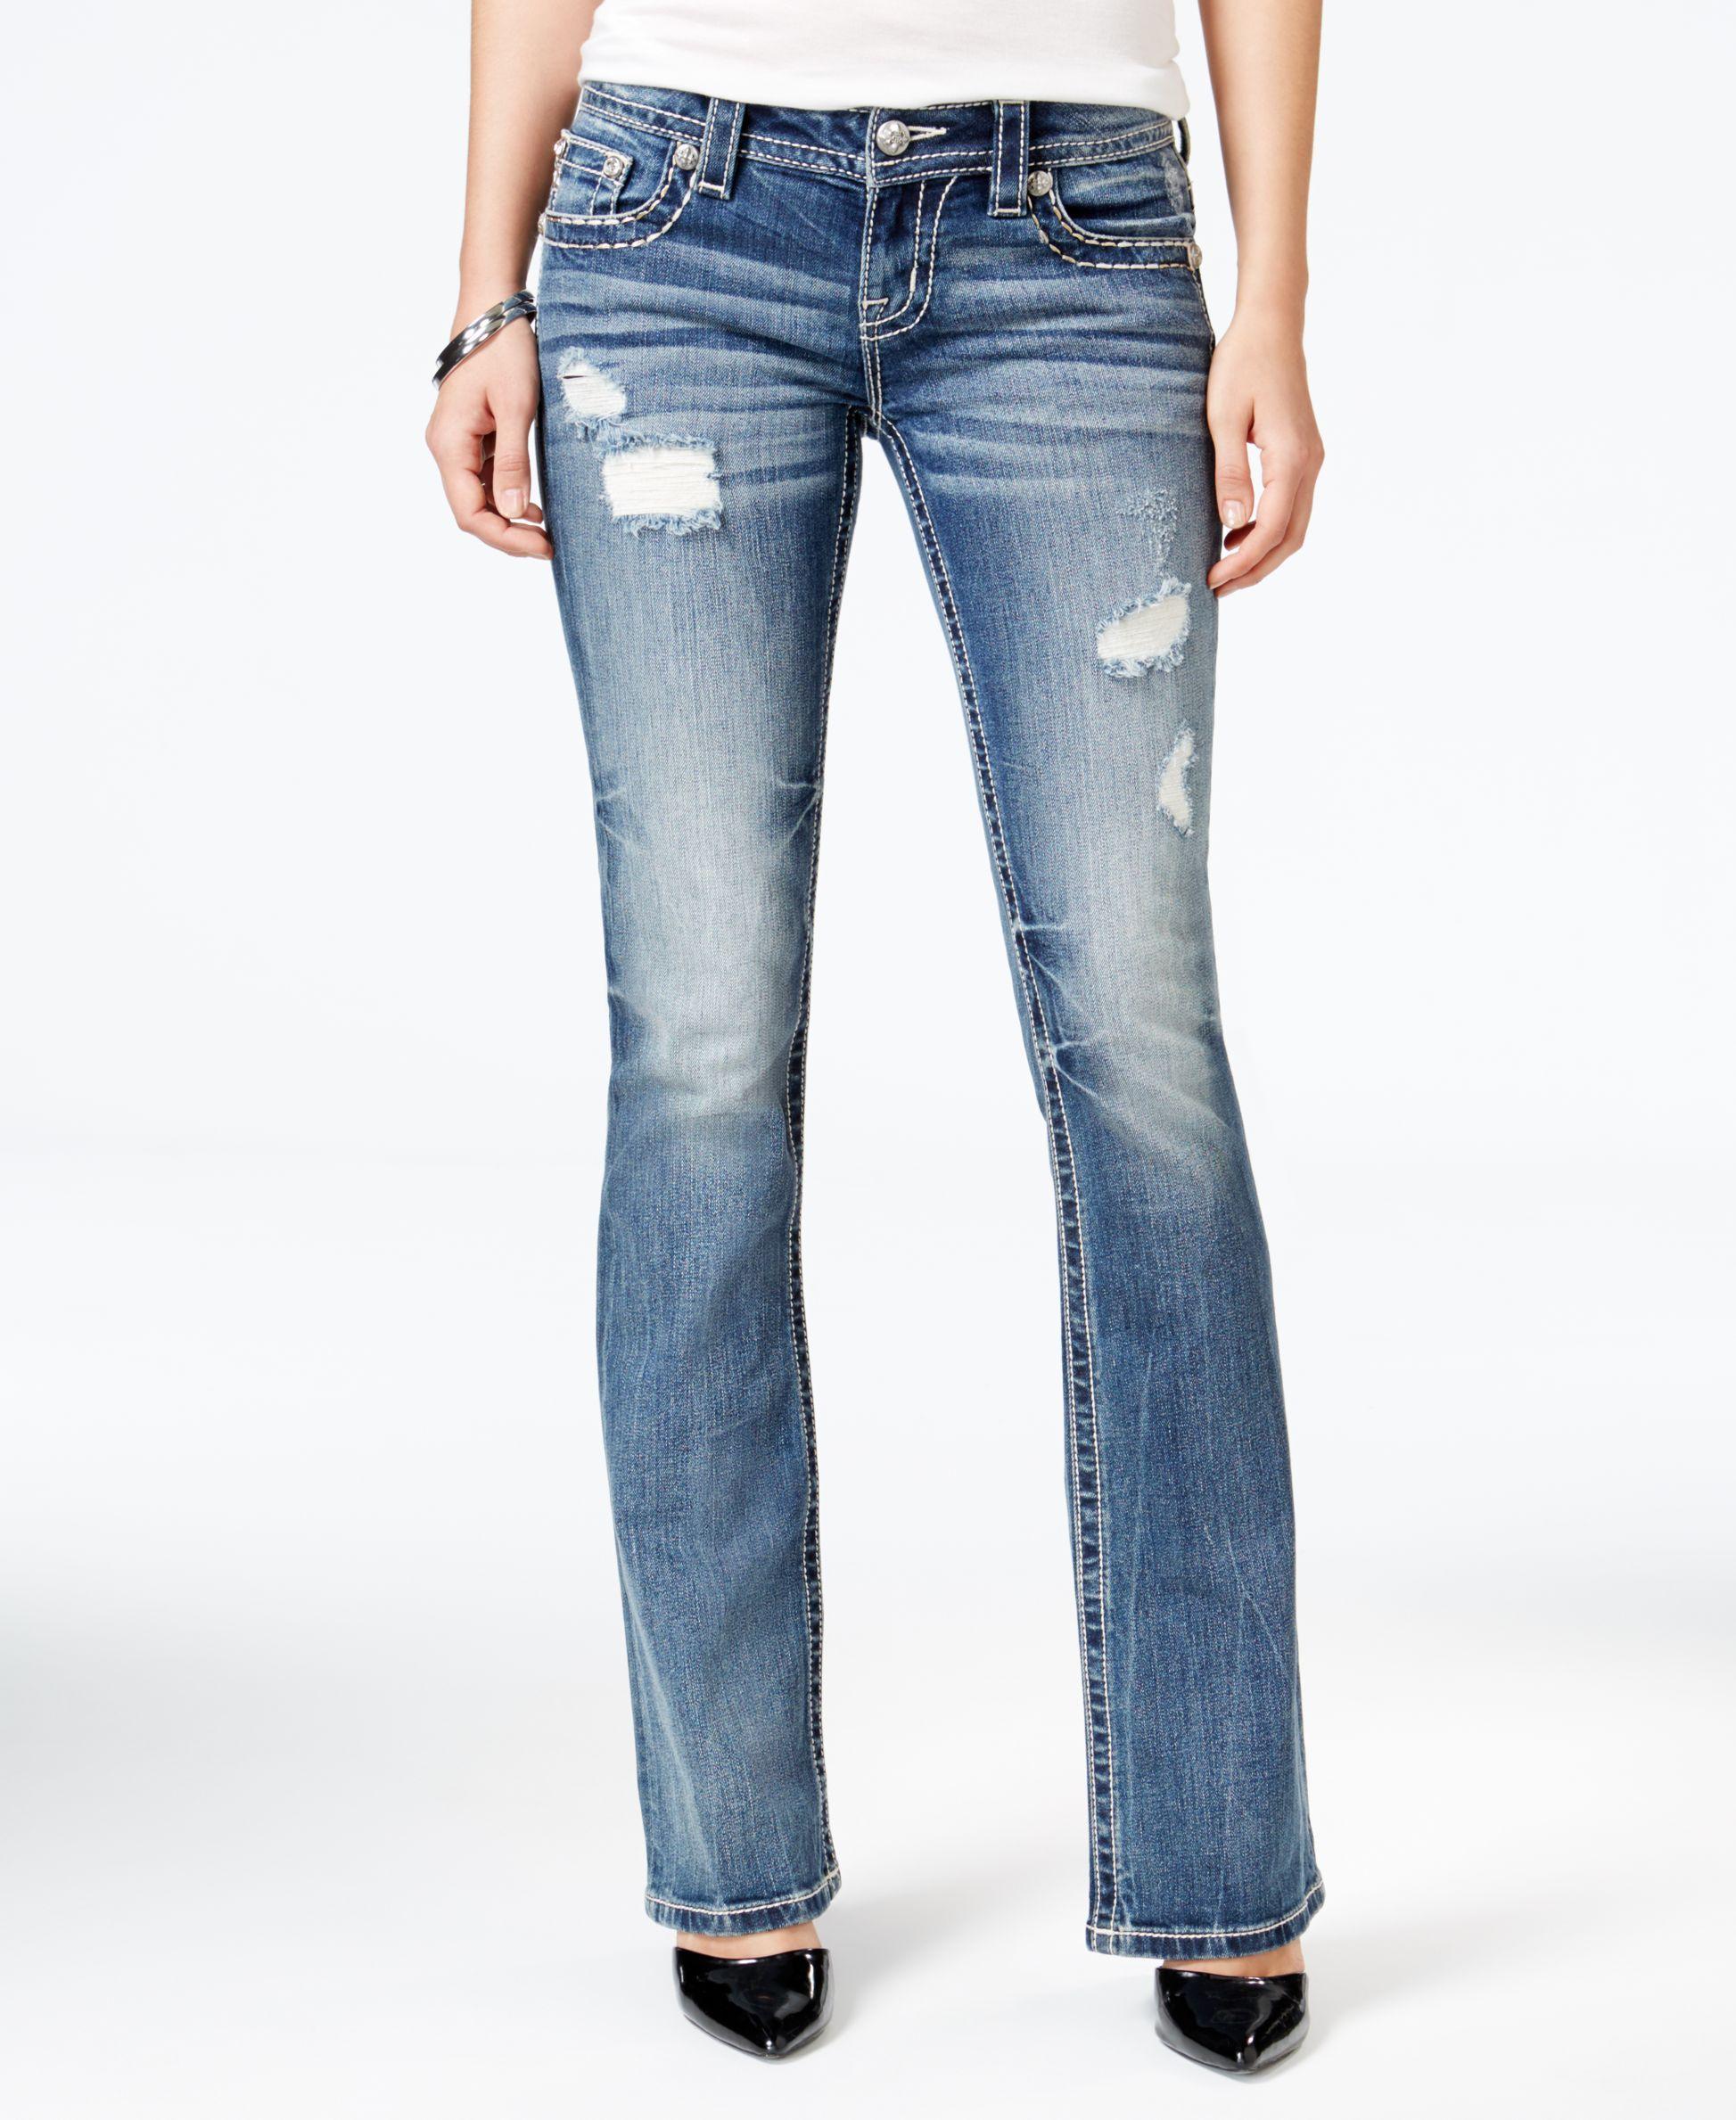 e53d0d7f8ea Miss Me Ripped Medium Blue Wash Bootcut Jeans | Fall | Jeans, Miss ...